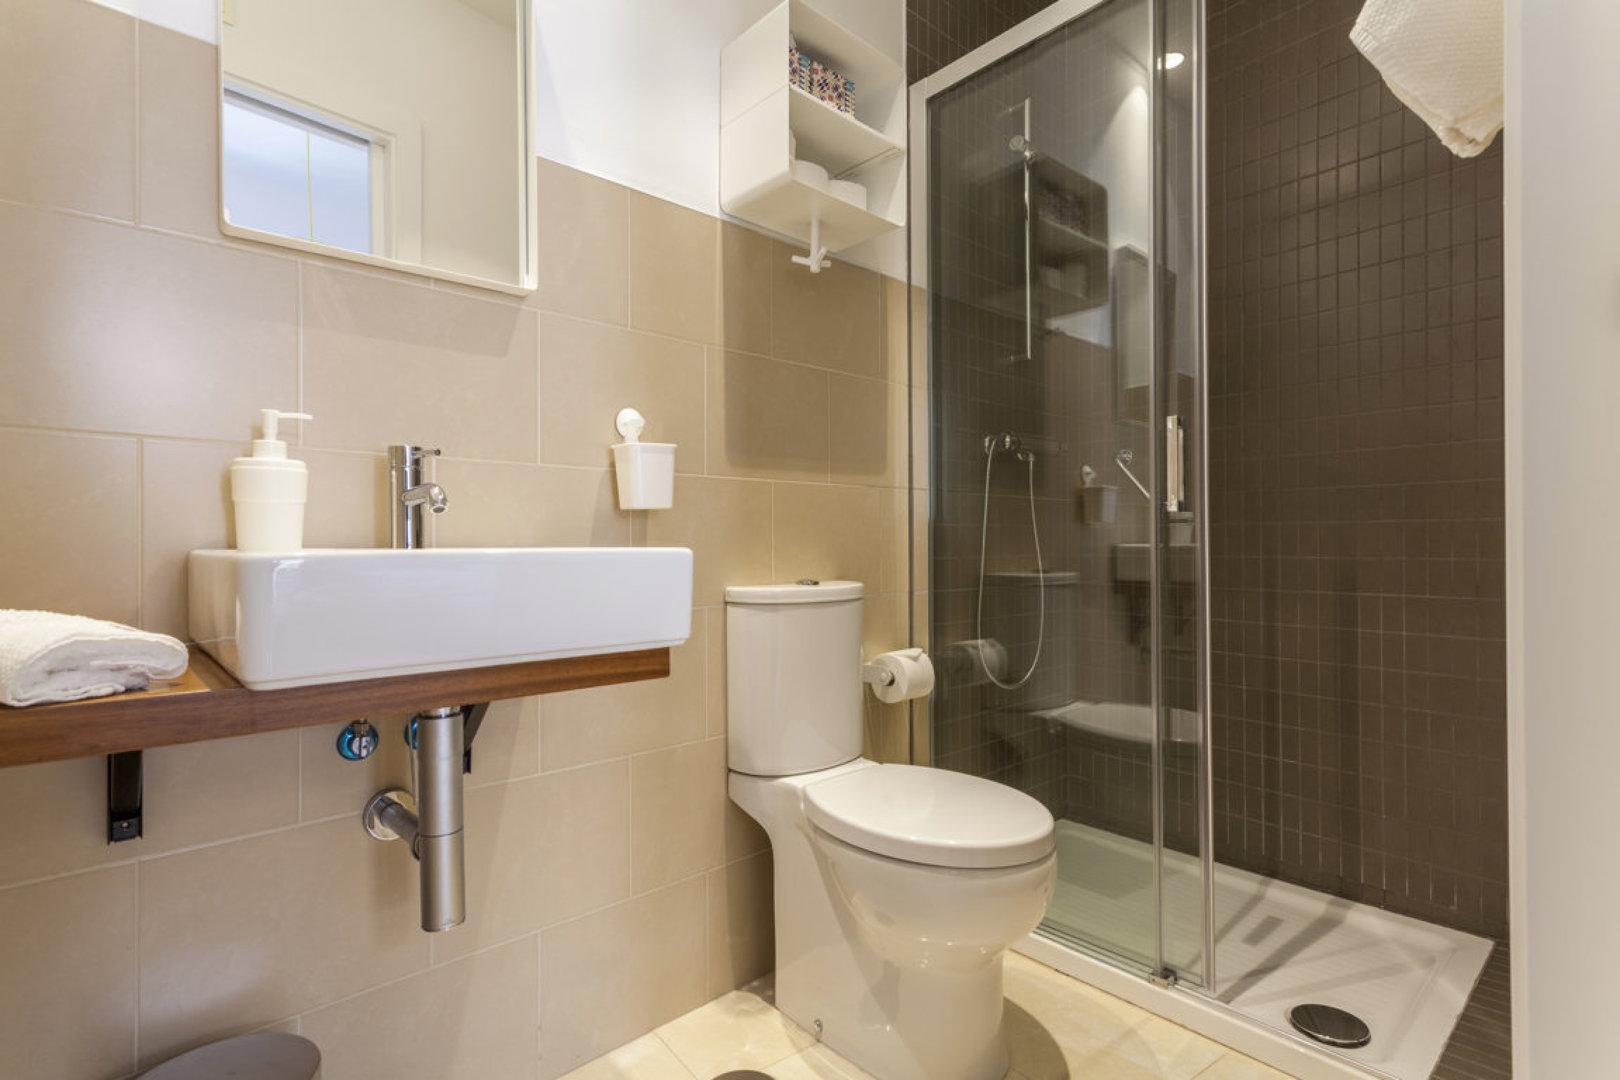 Baño con ducha alicatada